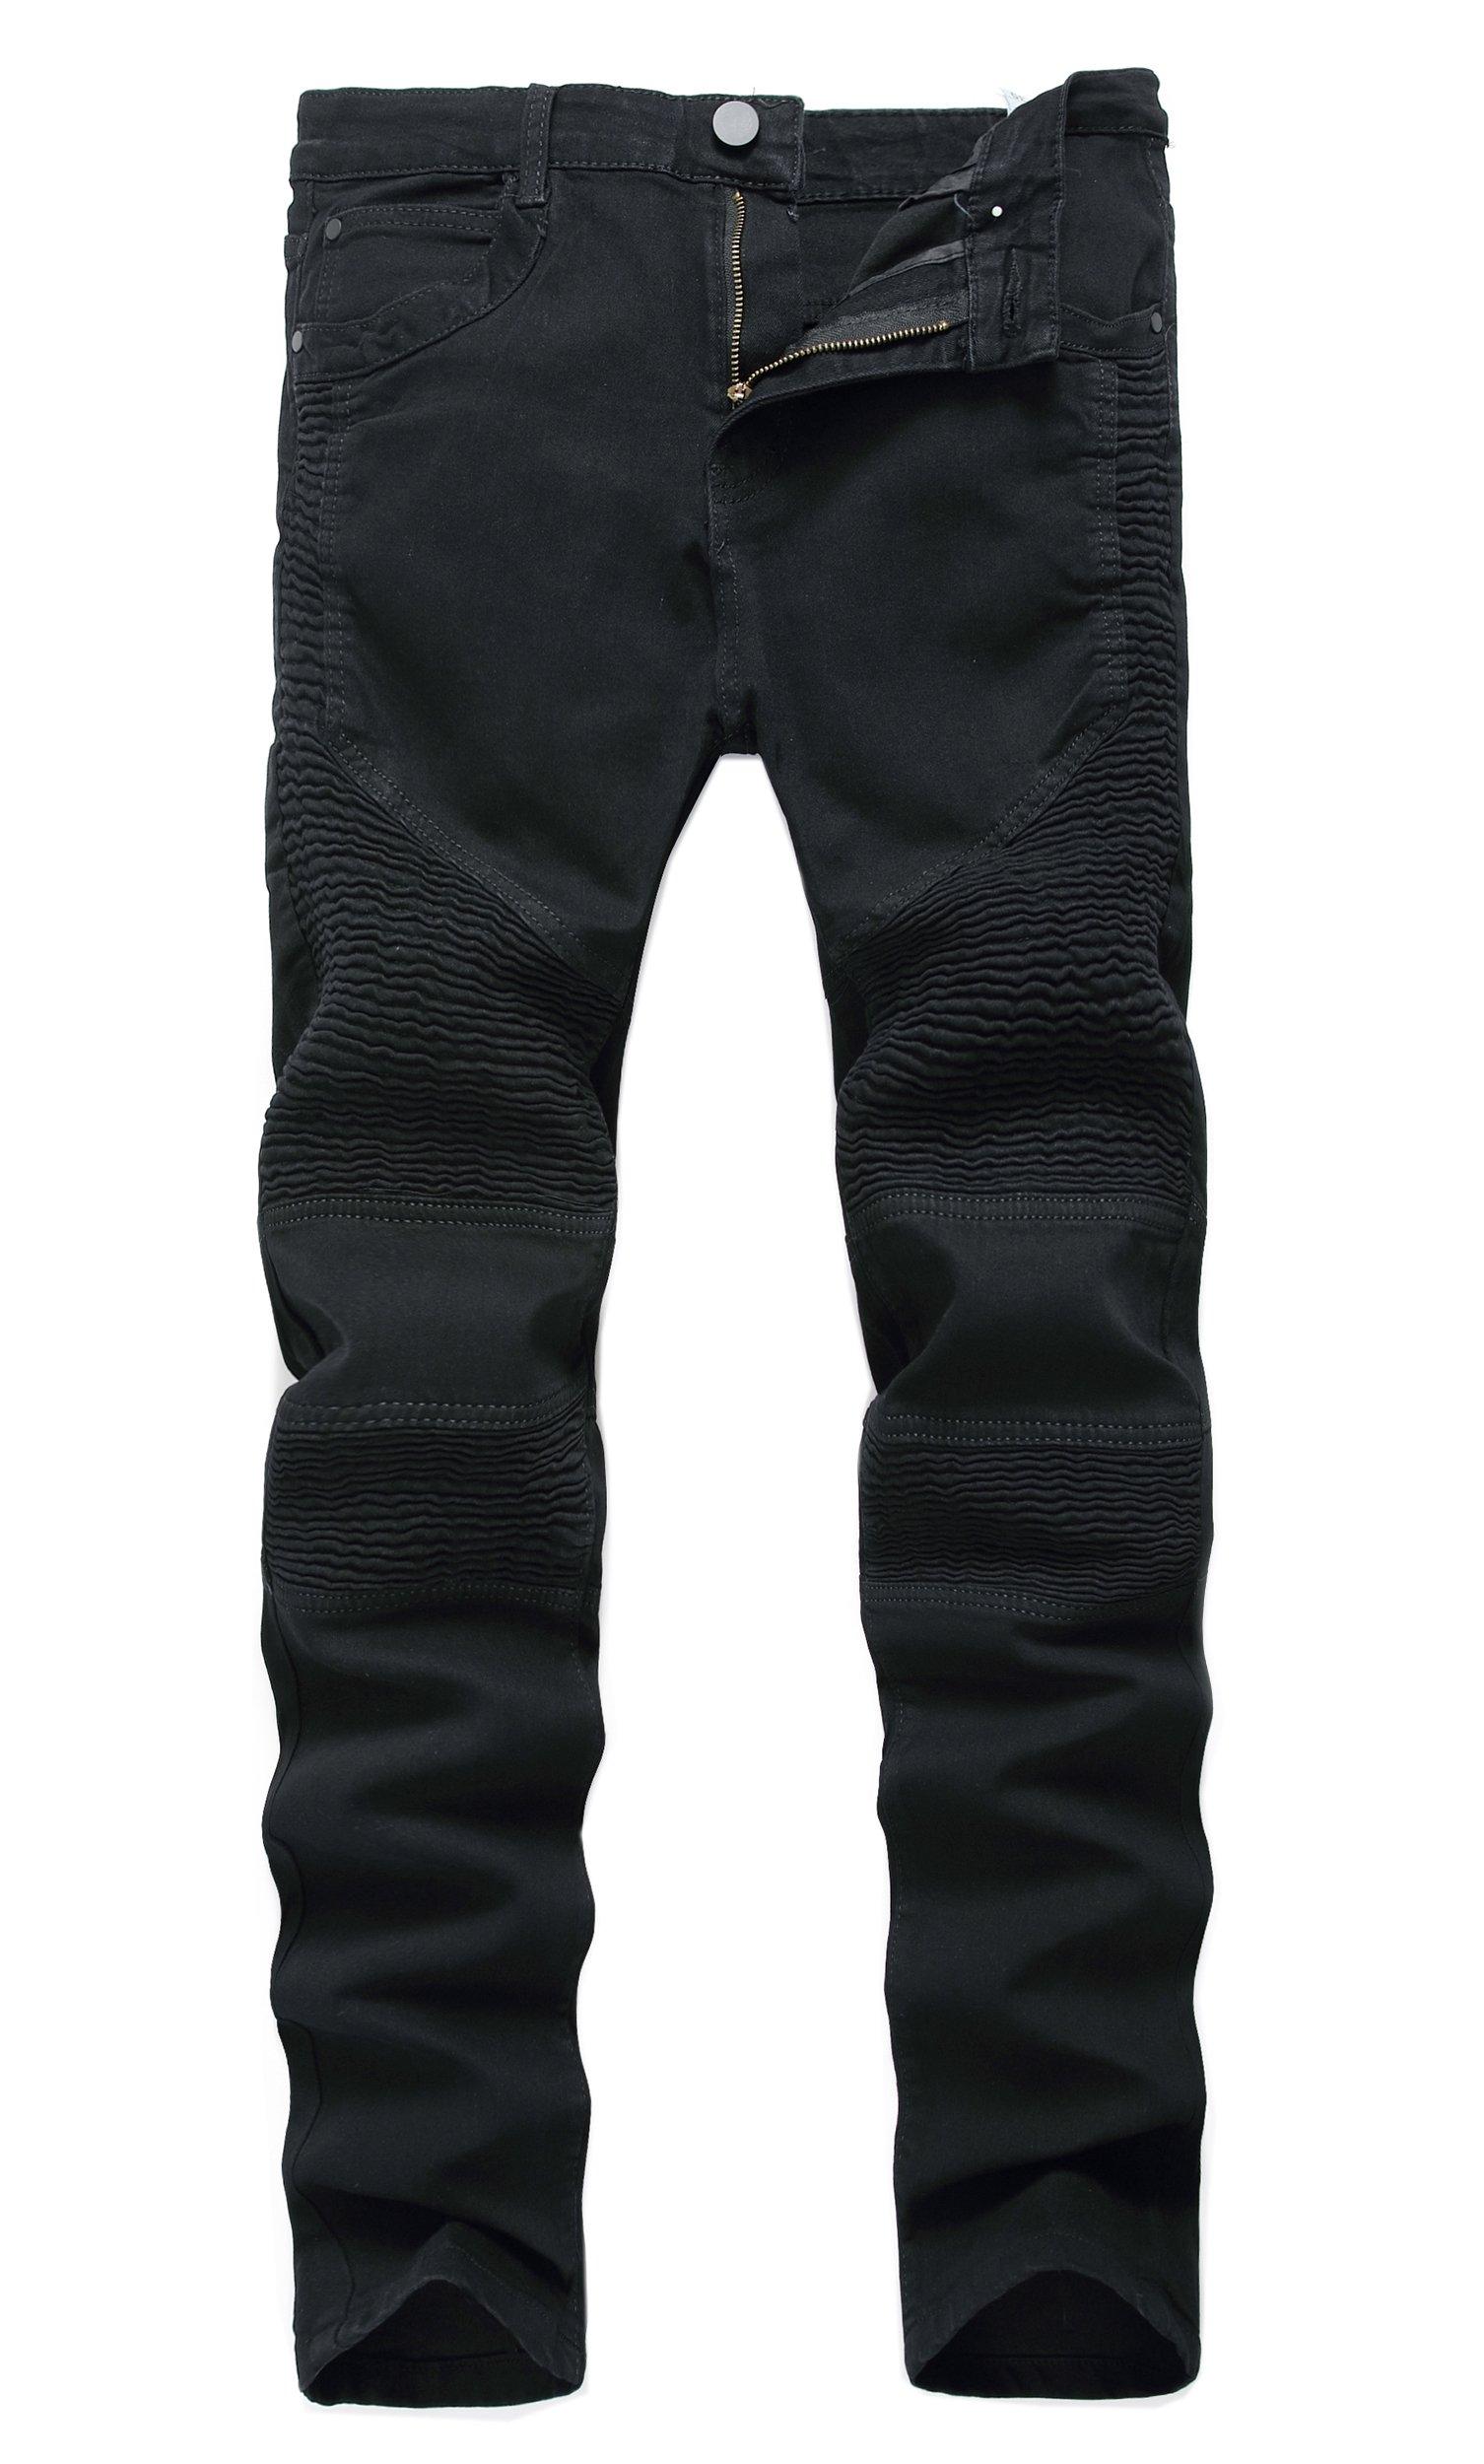 Kihatwin Men's Biker Moto Distressed Destroyed Fashion Skinny Jeans Slim Pants Black 30